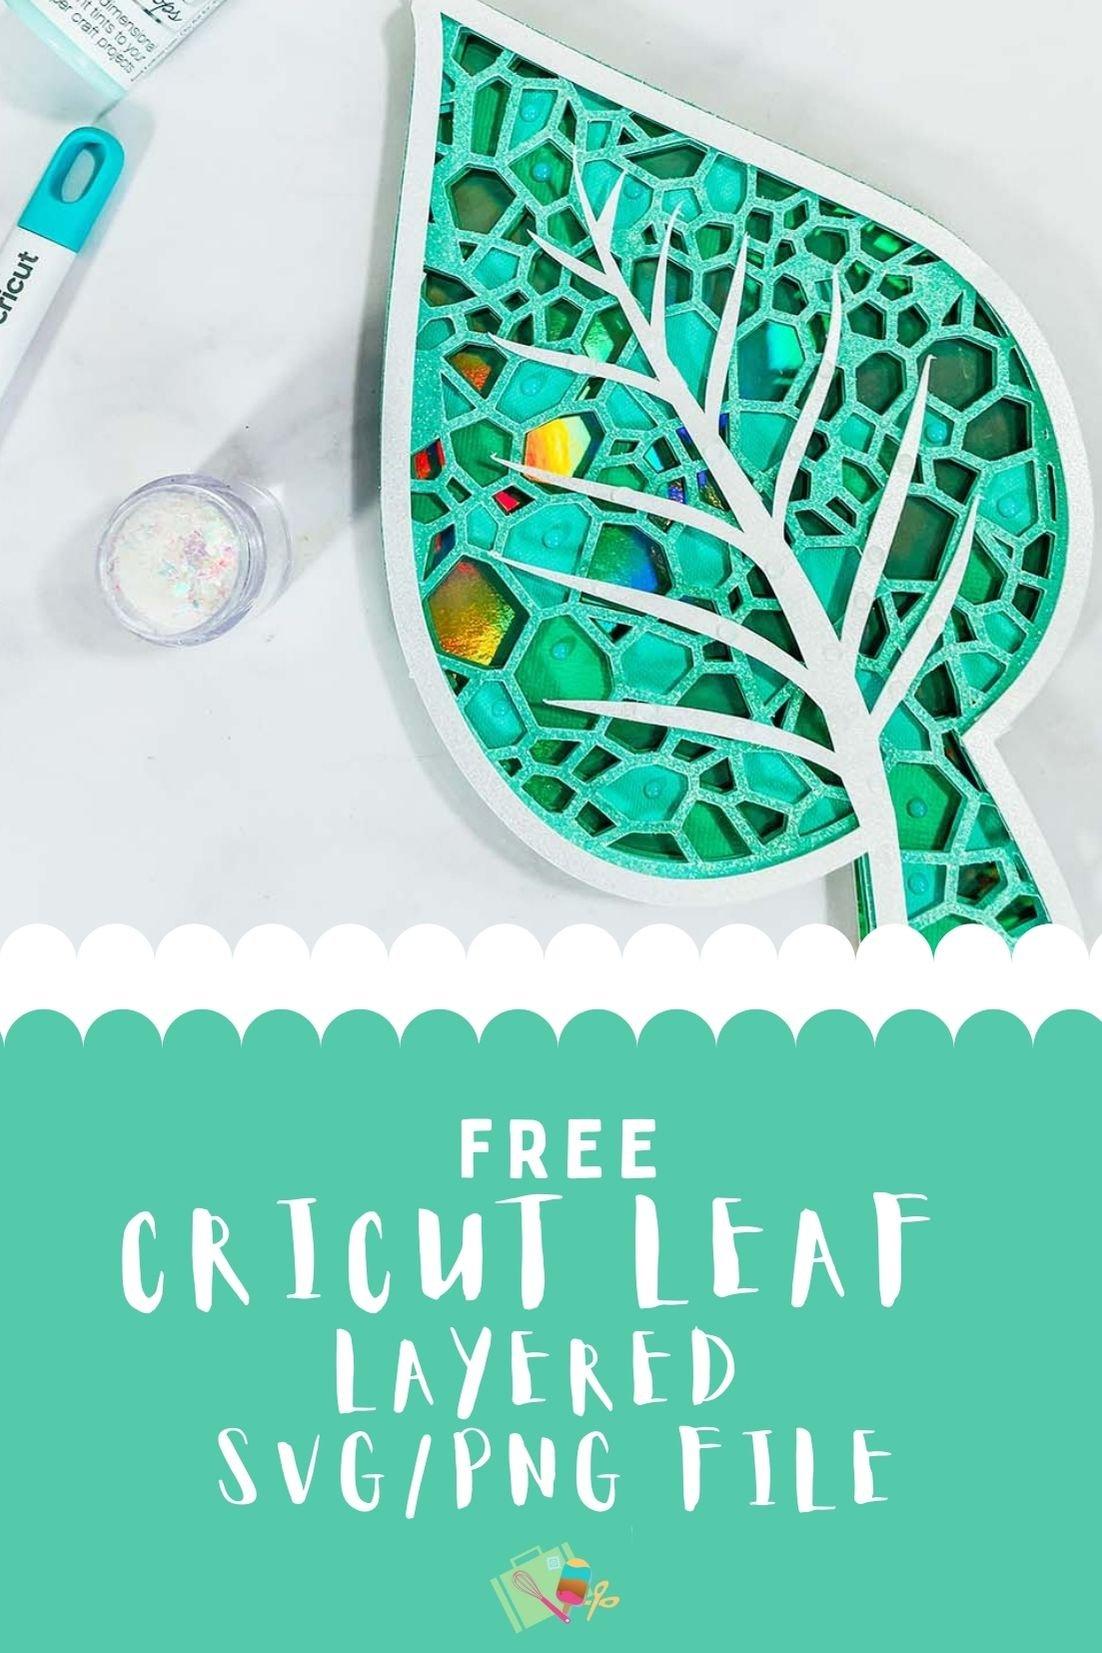 Free cricut leaf layered SVG File-2